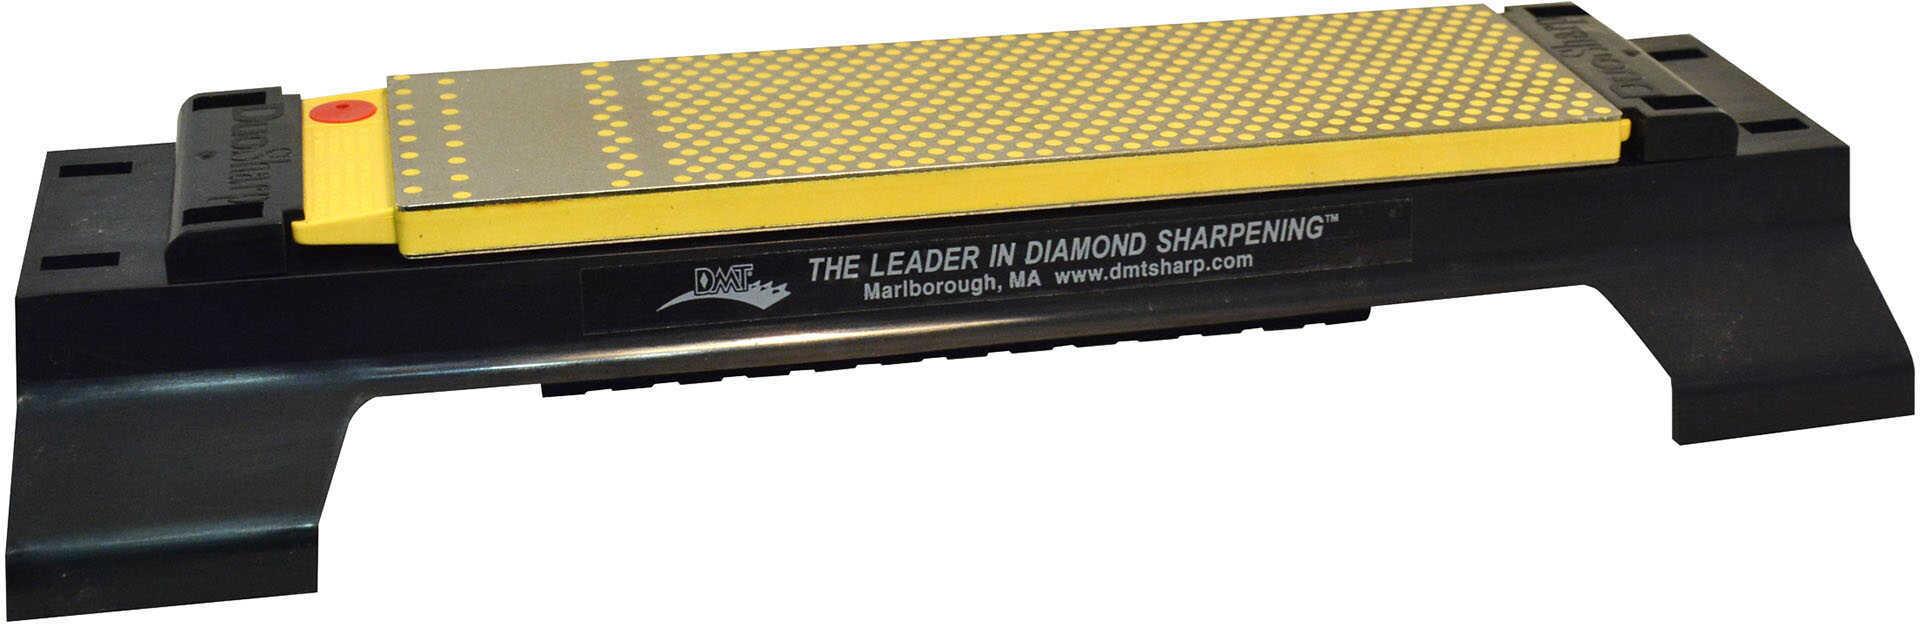 DMT Knife Sharpeners DMT 8 In. Duosharp Plus BnchStone Fine/Coarse WM8FC-WB